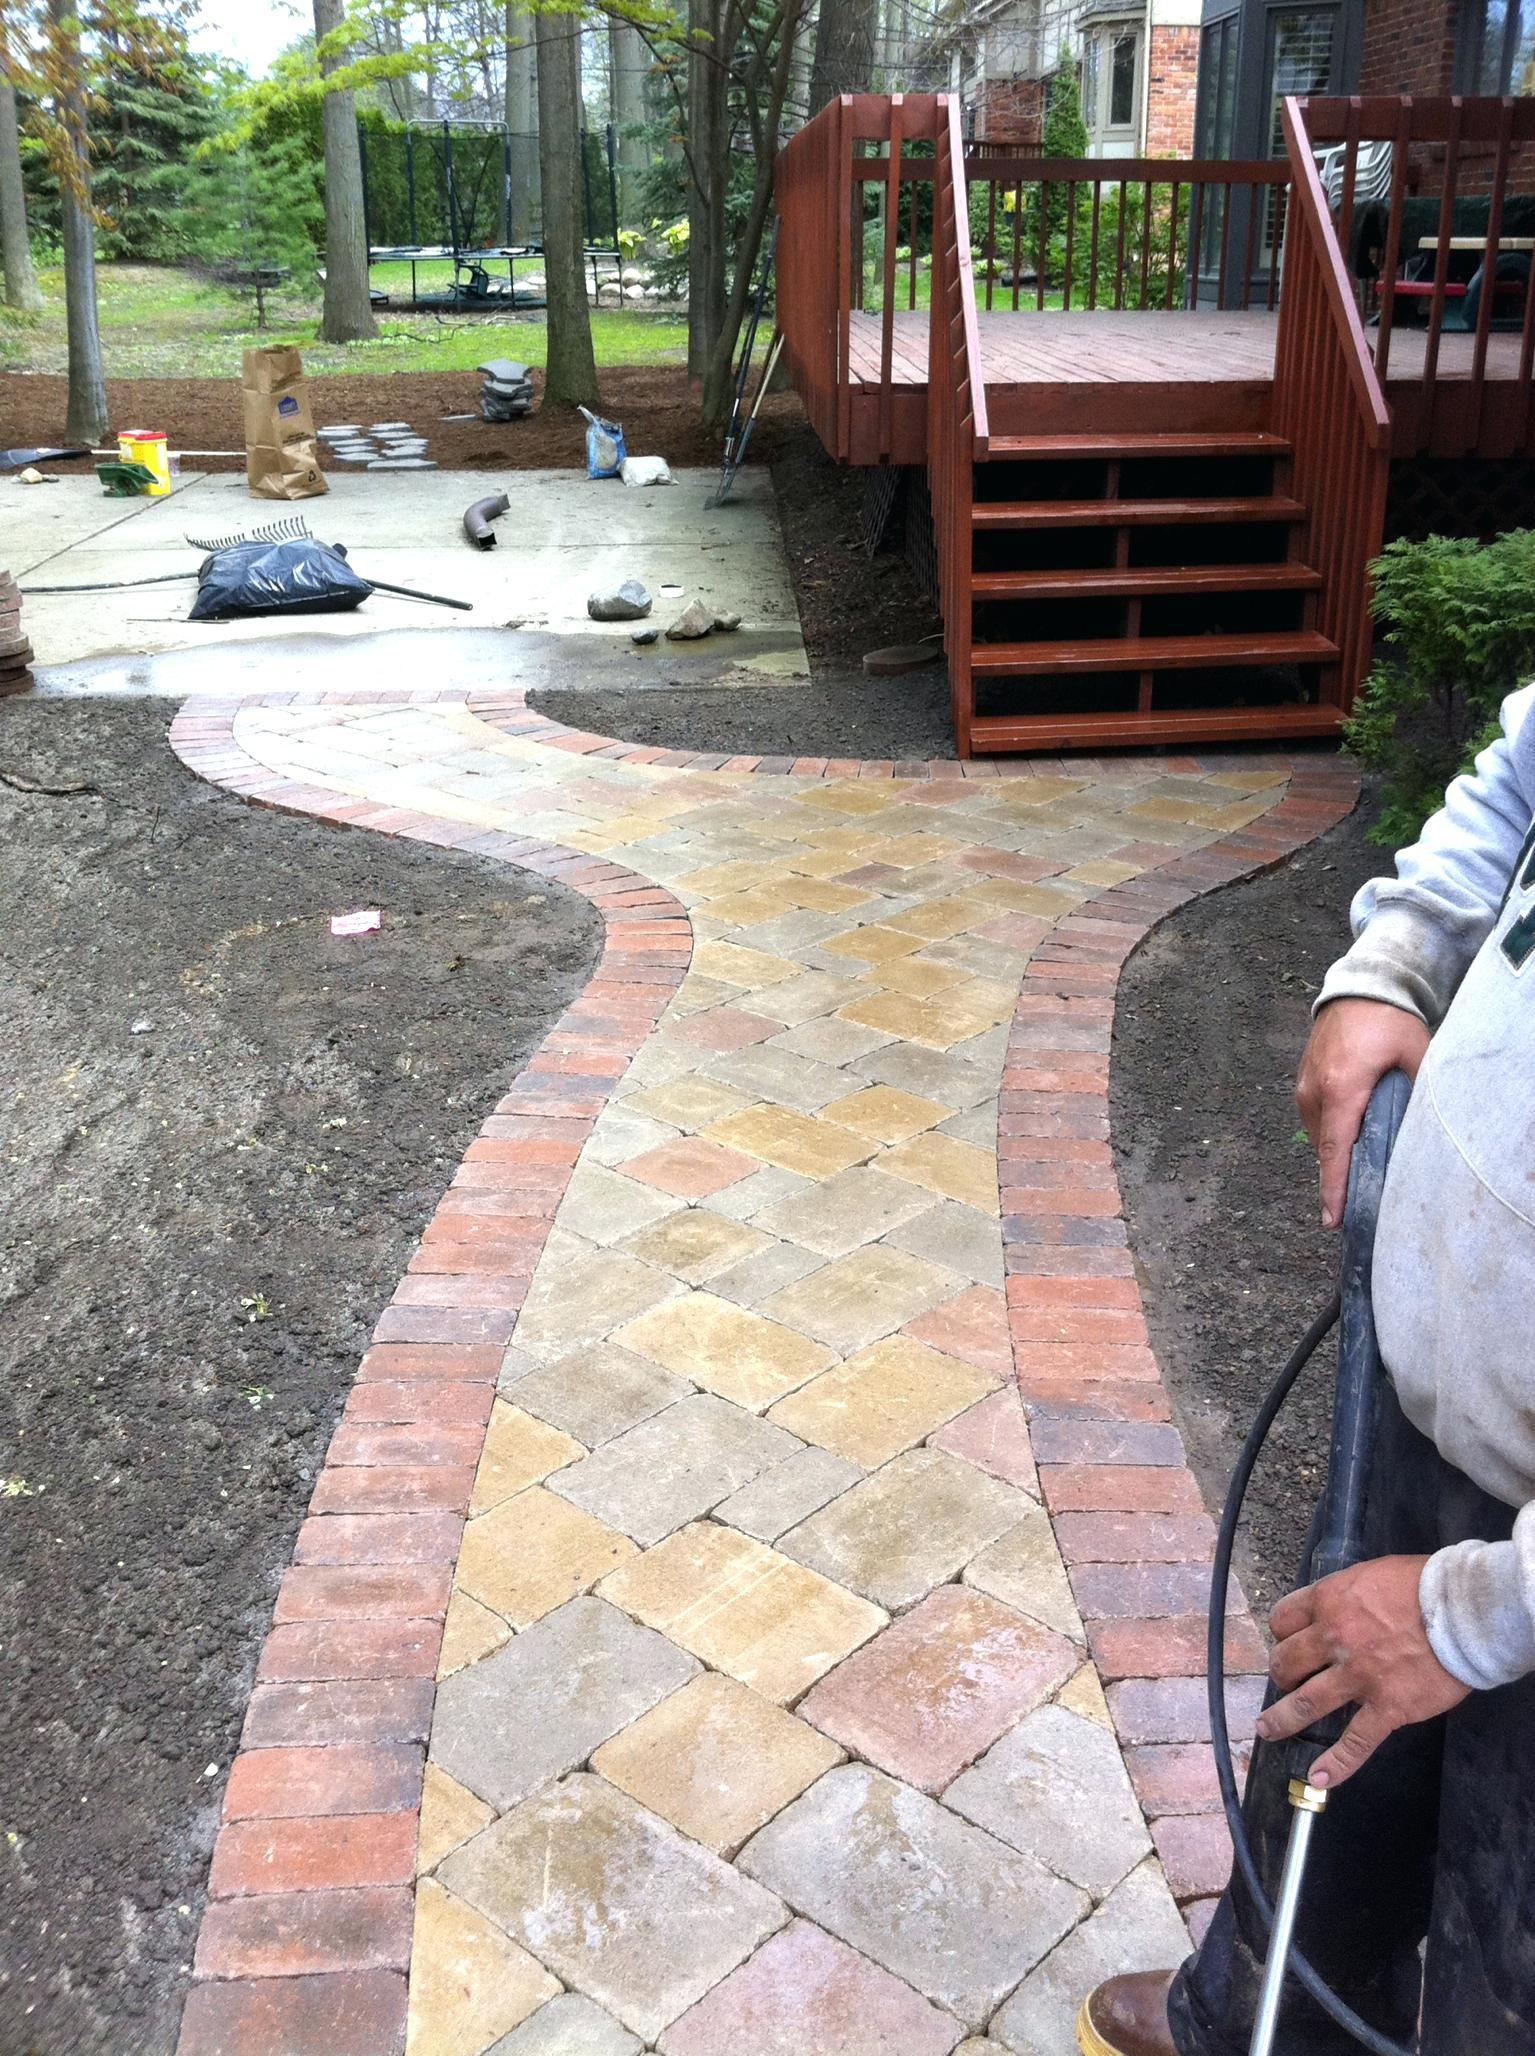 Superb Patio Design:Brick Walkway Paver Patio Calculator Designs Photos Porch Cool  Design Backyard Full Size